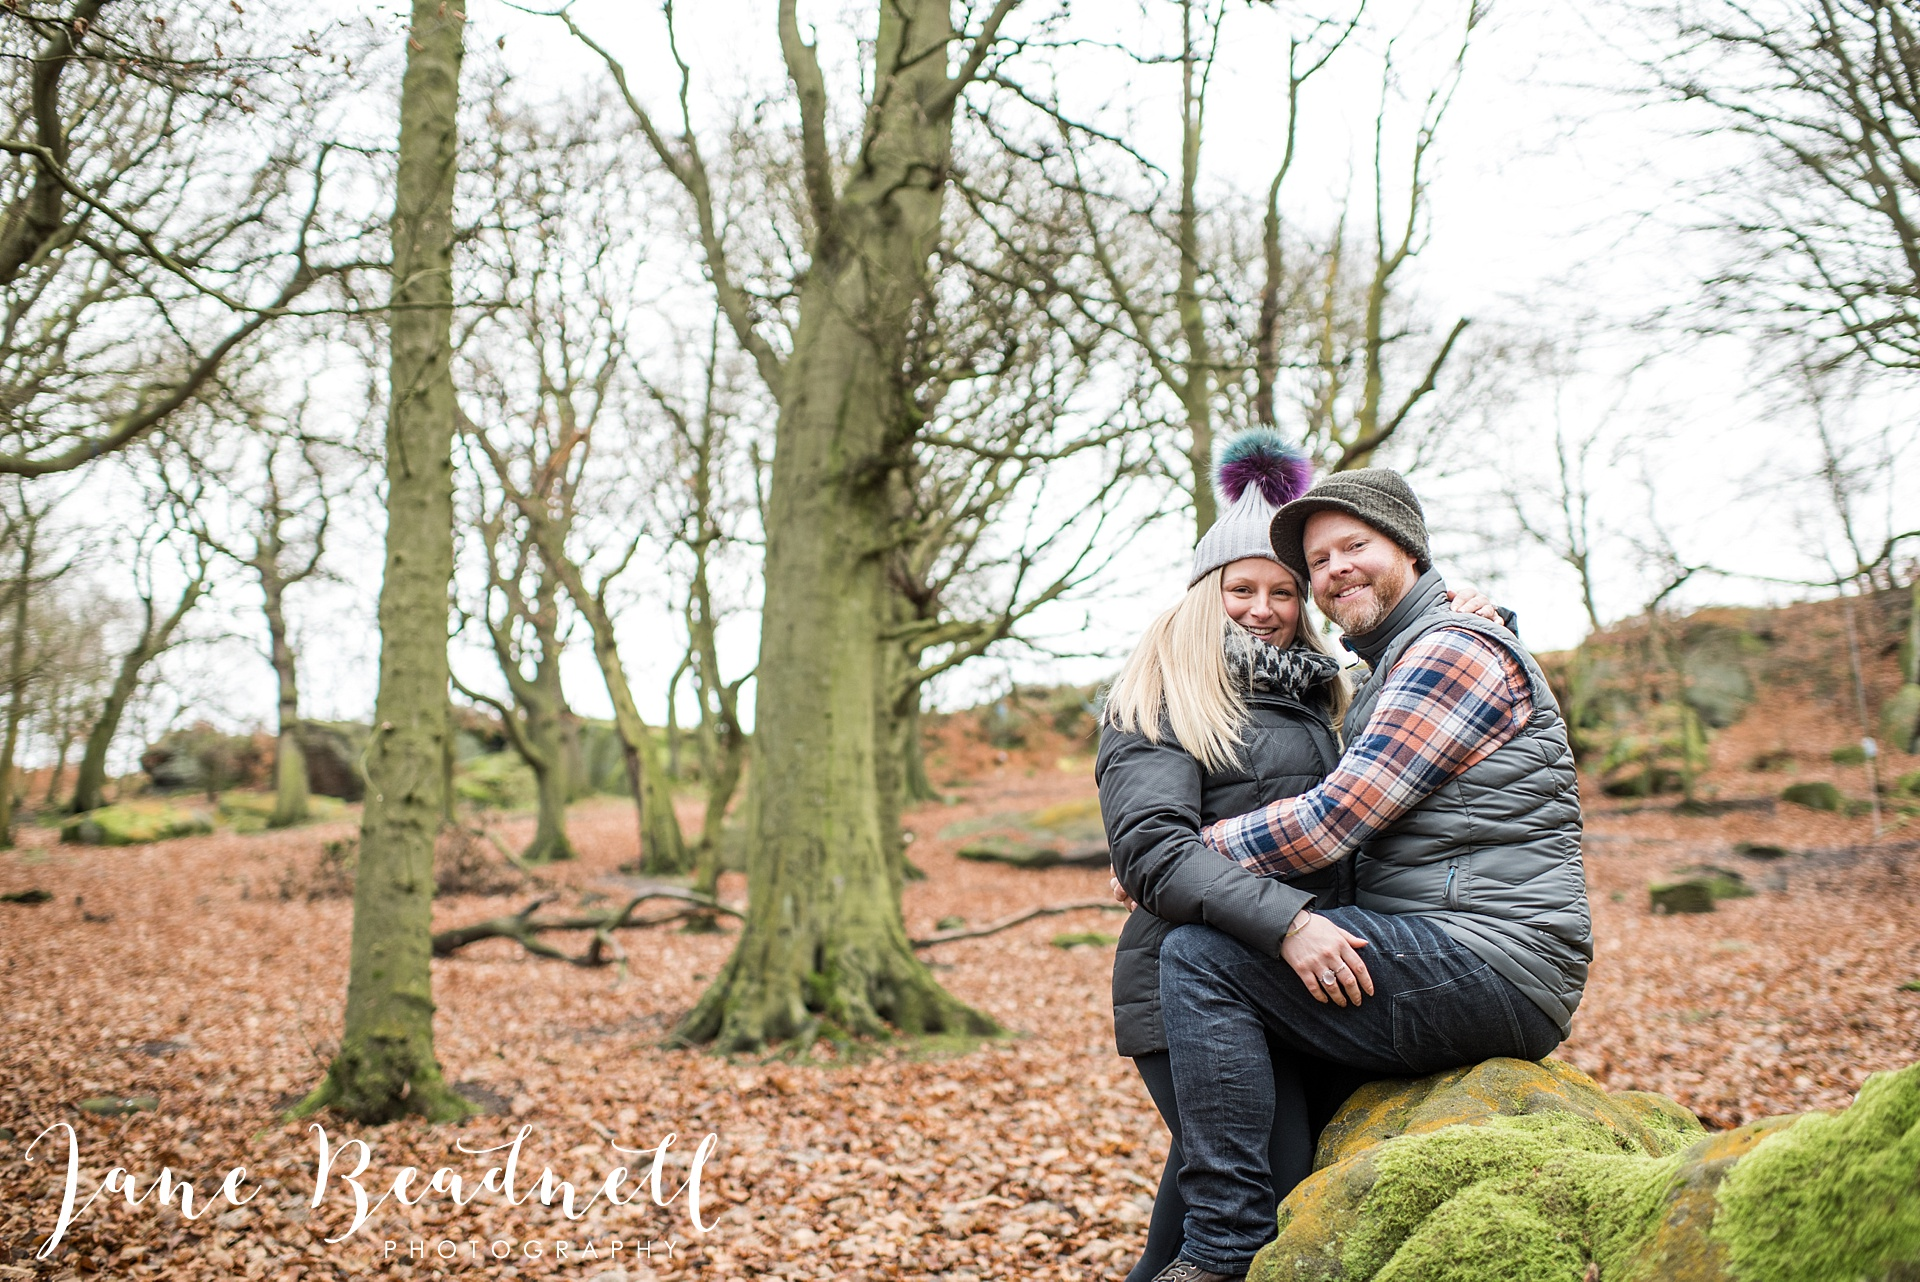 yorkshire-wedding-photographer-jane-beadnell-photography-uk-and-destination-wedding-photographer-engagement-shoot_0046